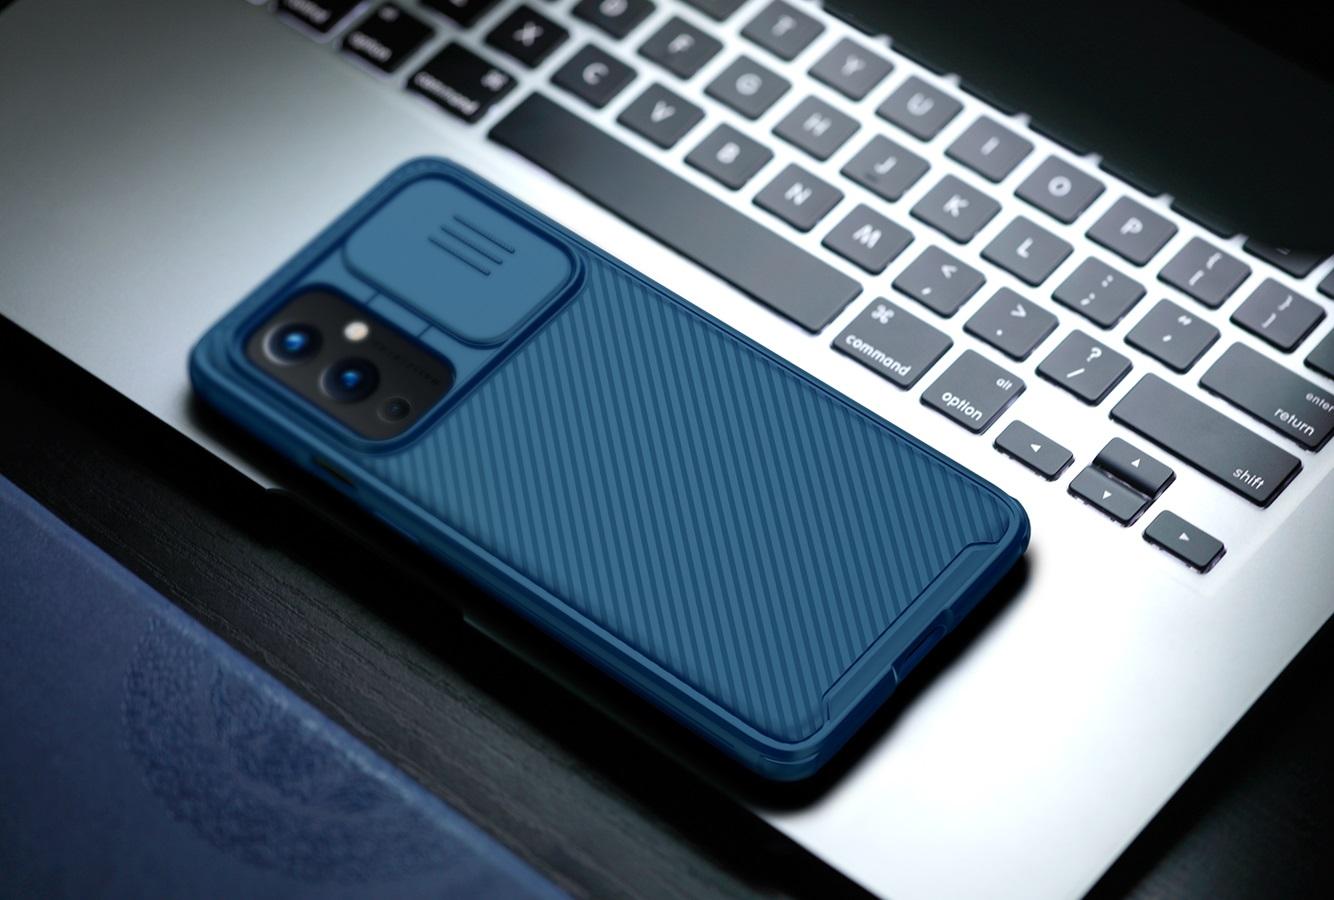 OnePlus_9_CamShield_Pro_Case-11.jpg